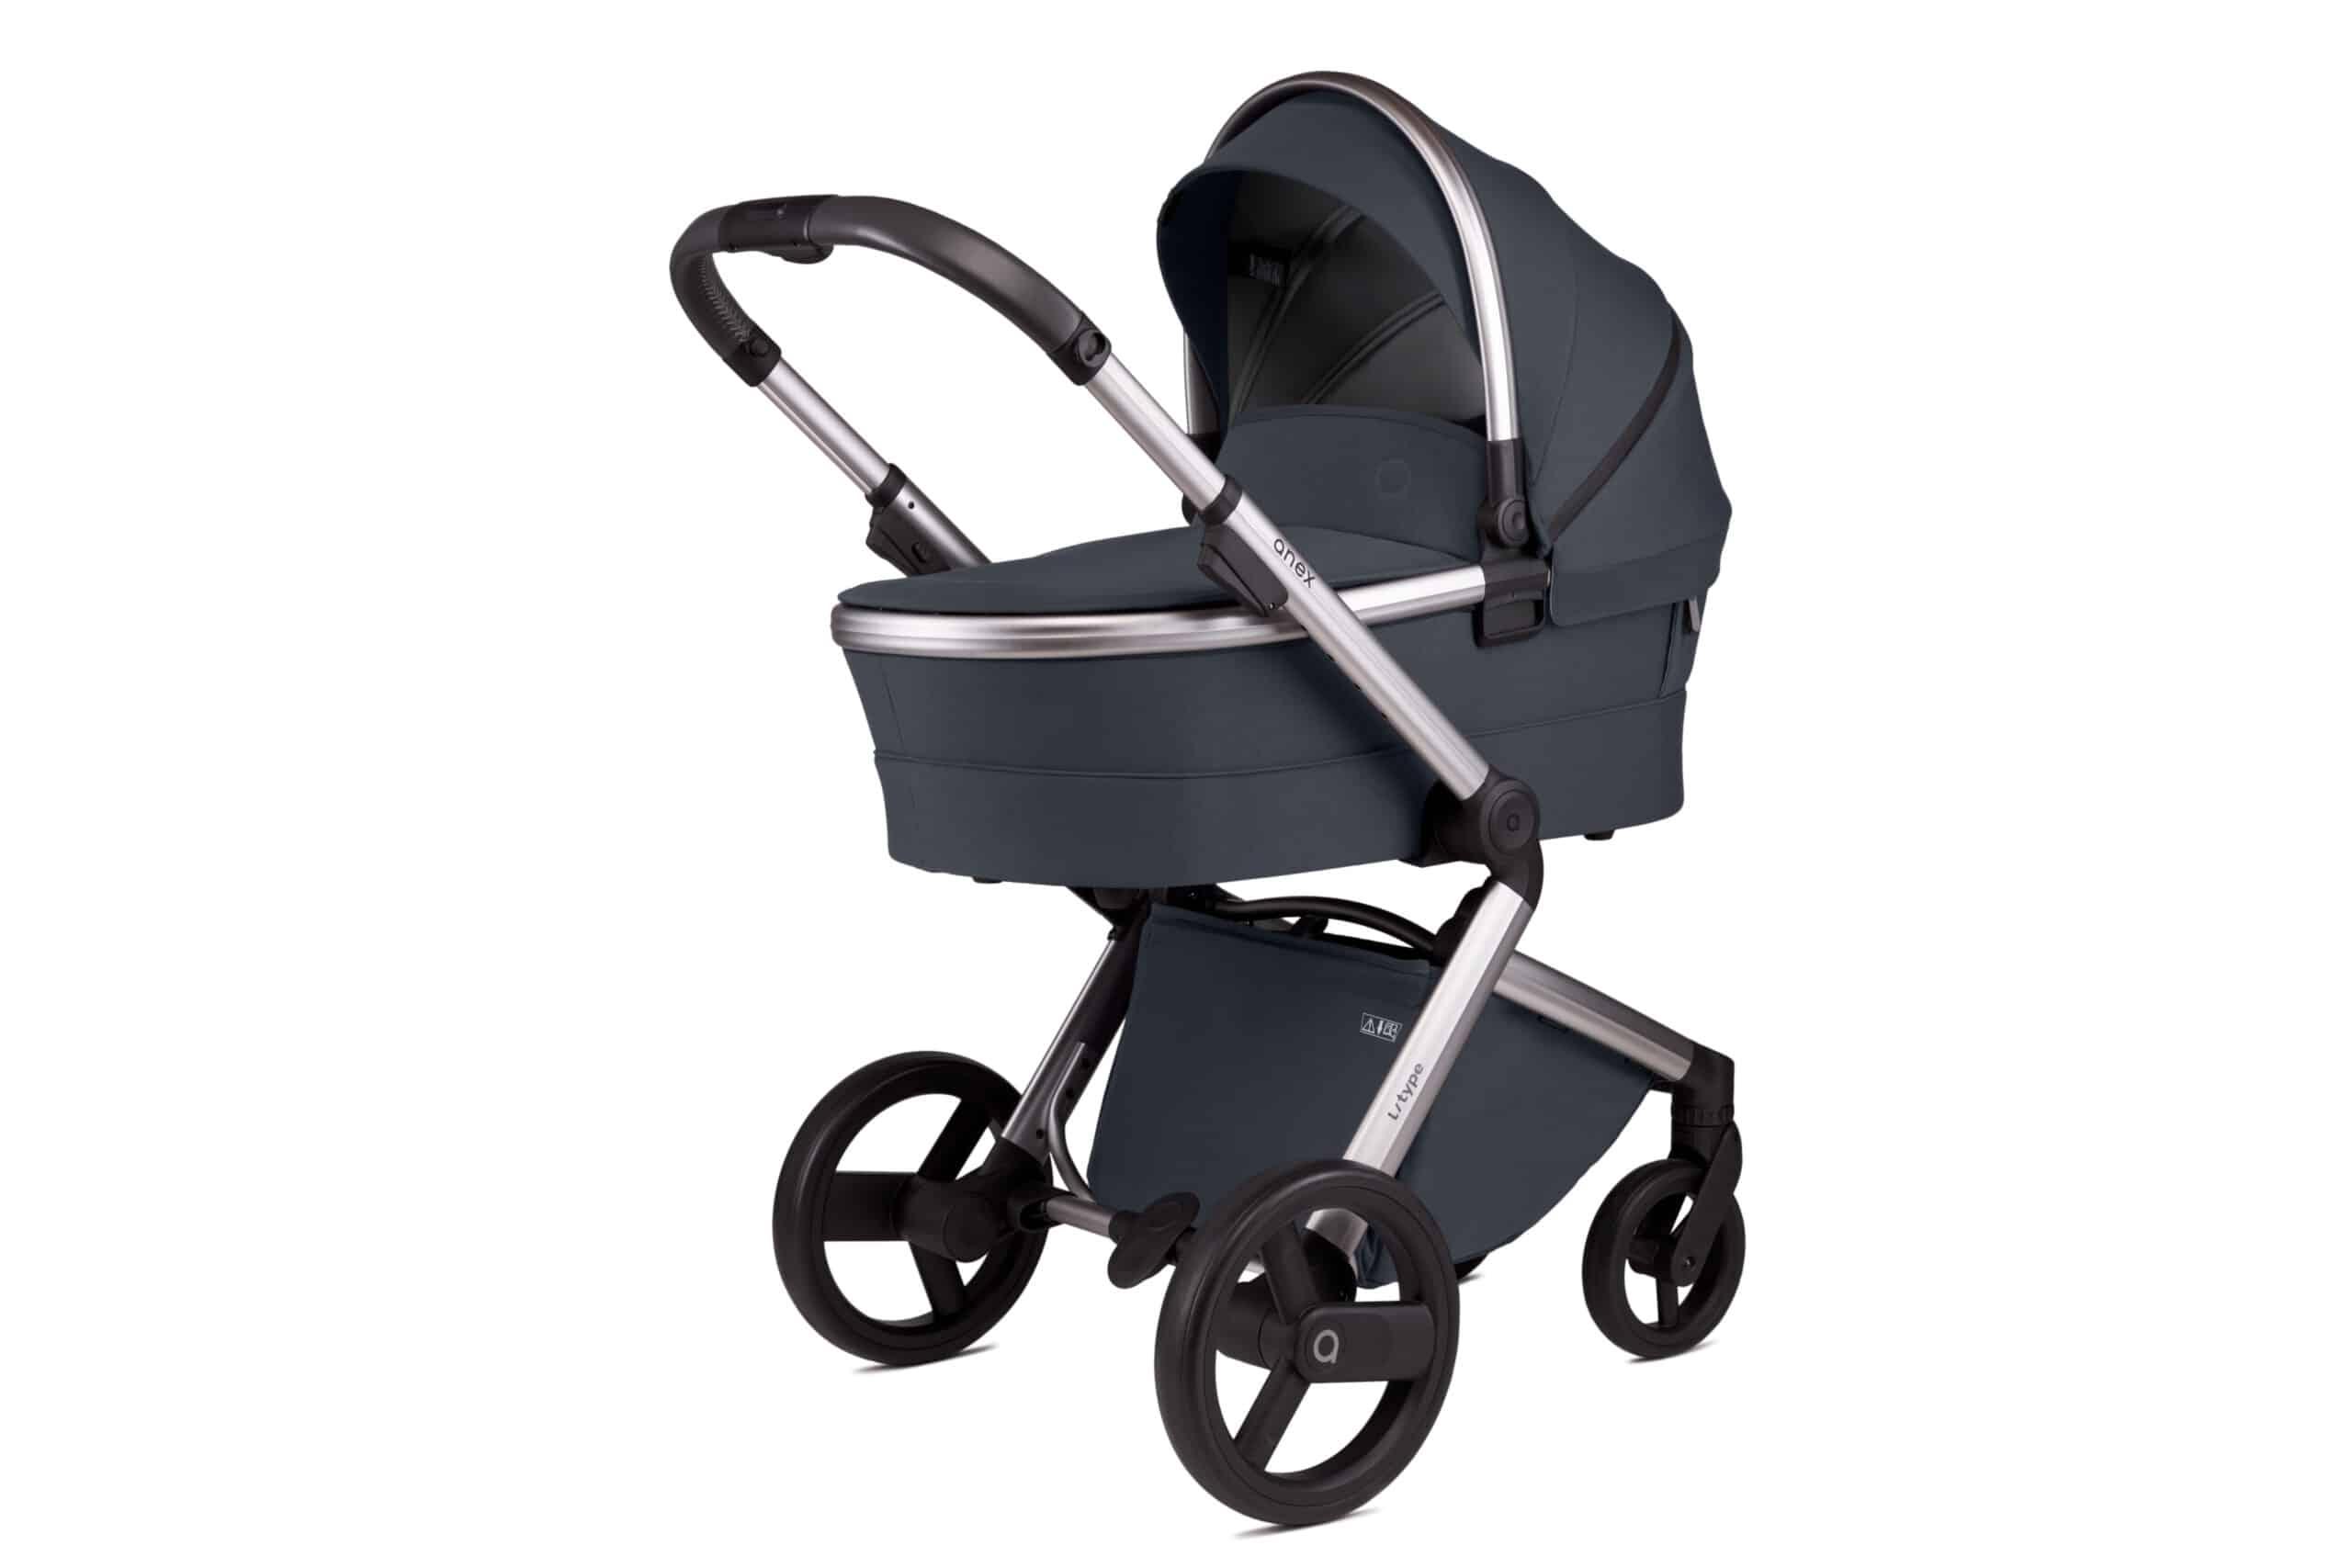 Babyspeciaalzaak | Baby's Paradijs | L type for the web7383 2 scaled